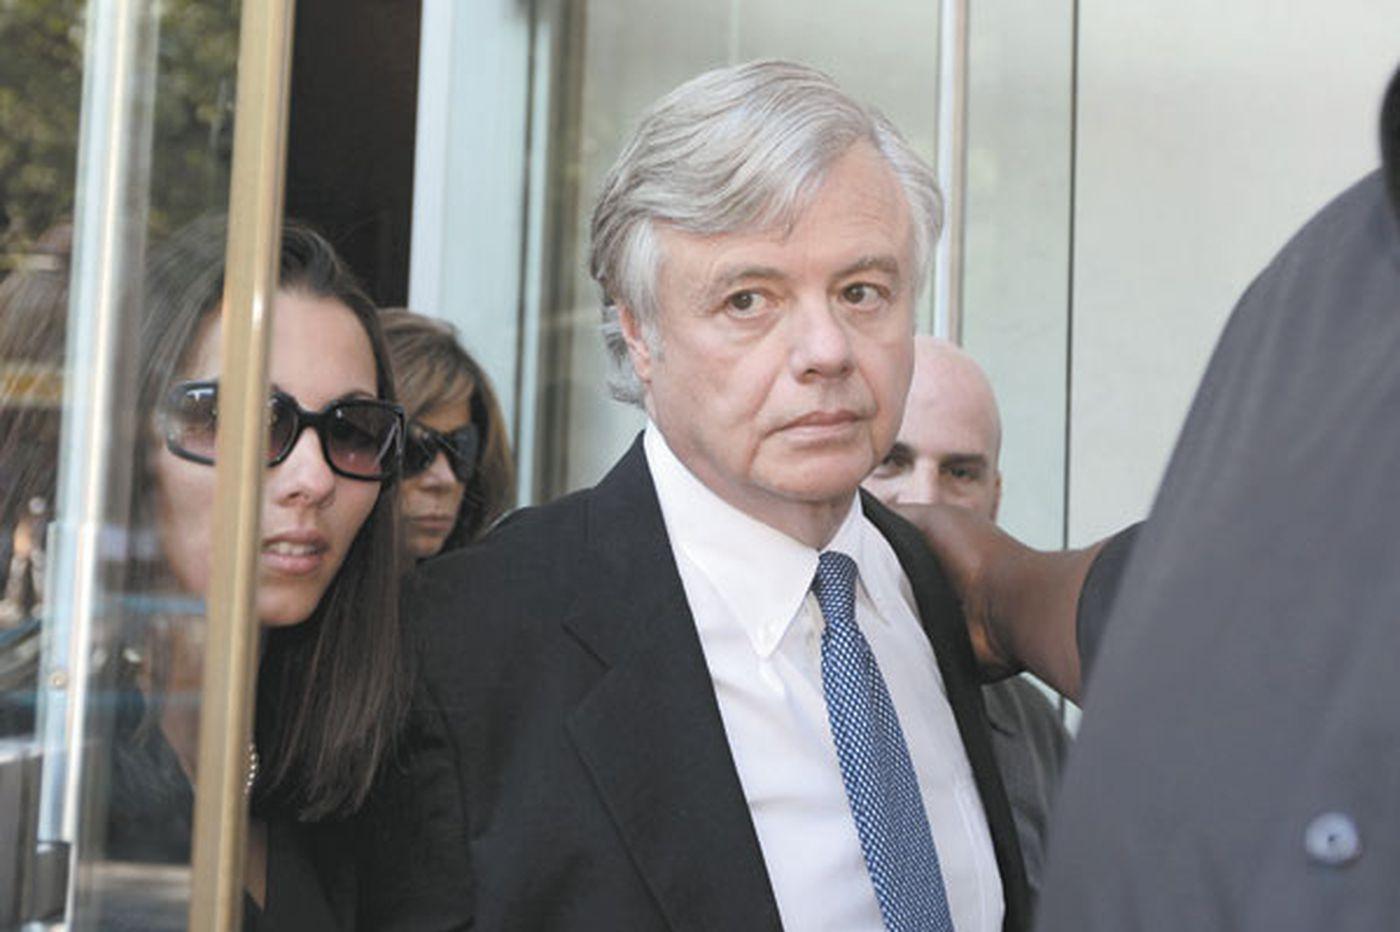 Prosecutors seek to increase Fumo's penalty by nearly $800,000